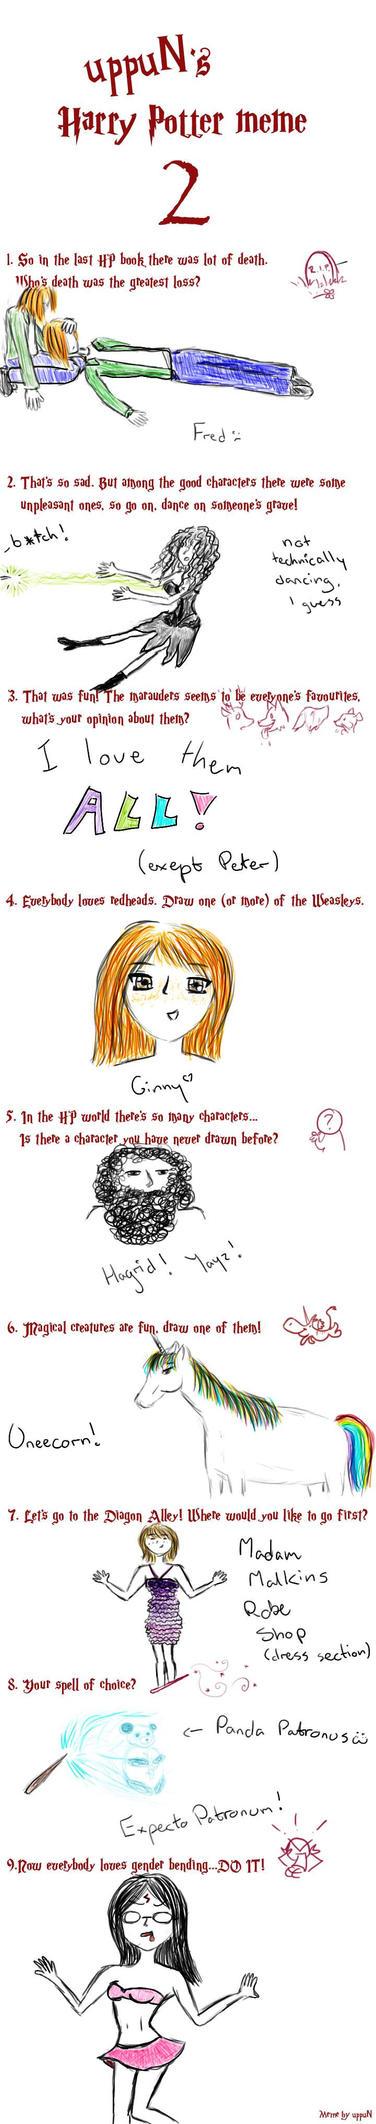 HP meme 2 by GryffindorGurl